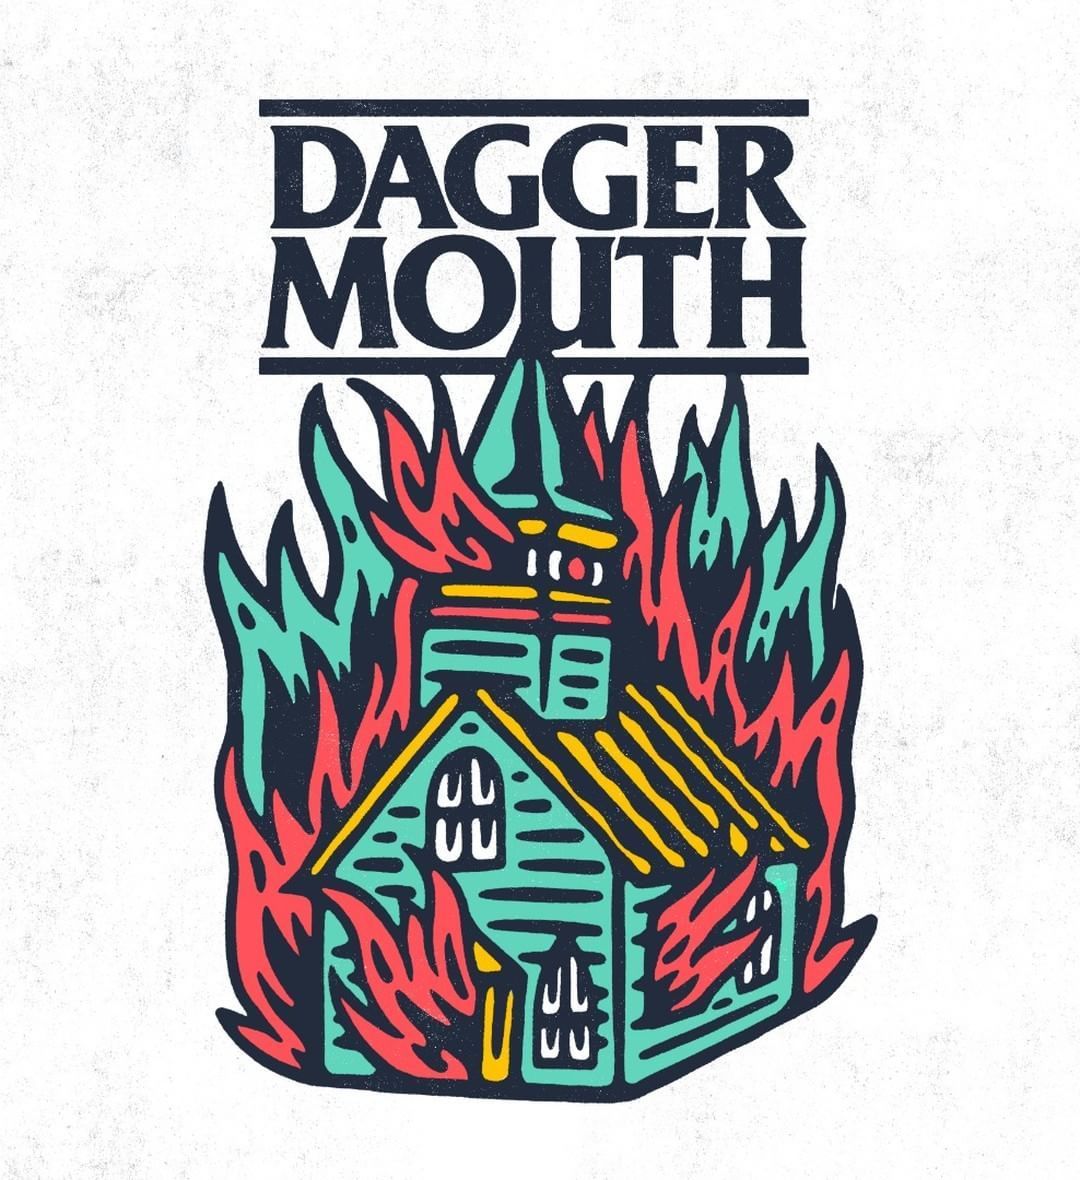 Tshirt design for daggermouth604 poppunk patch band